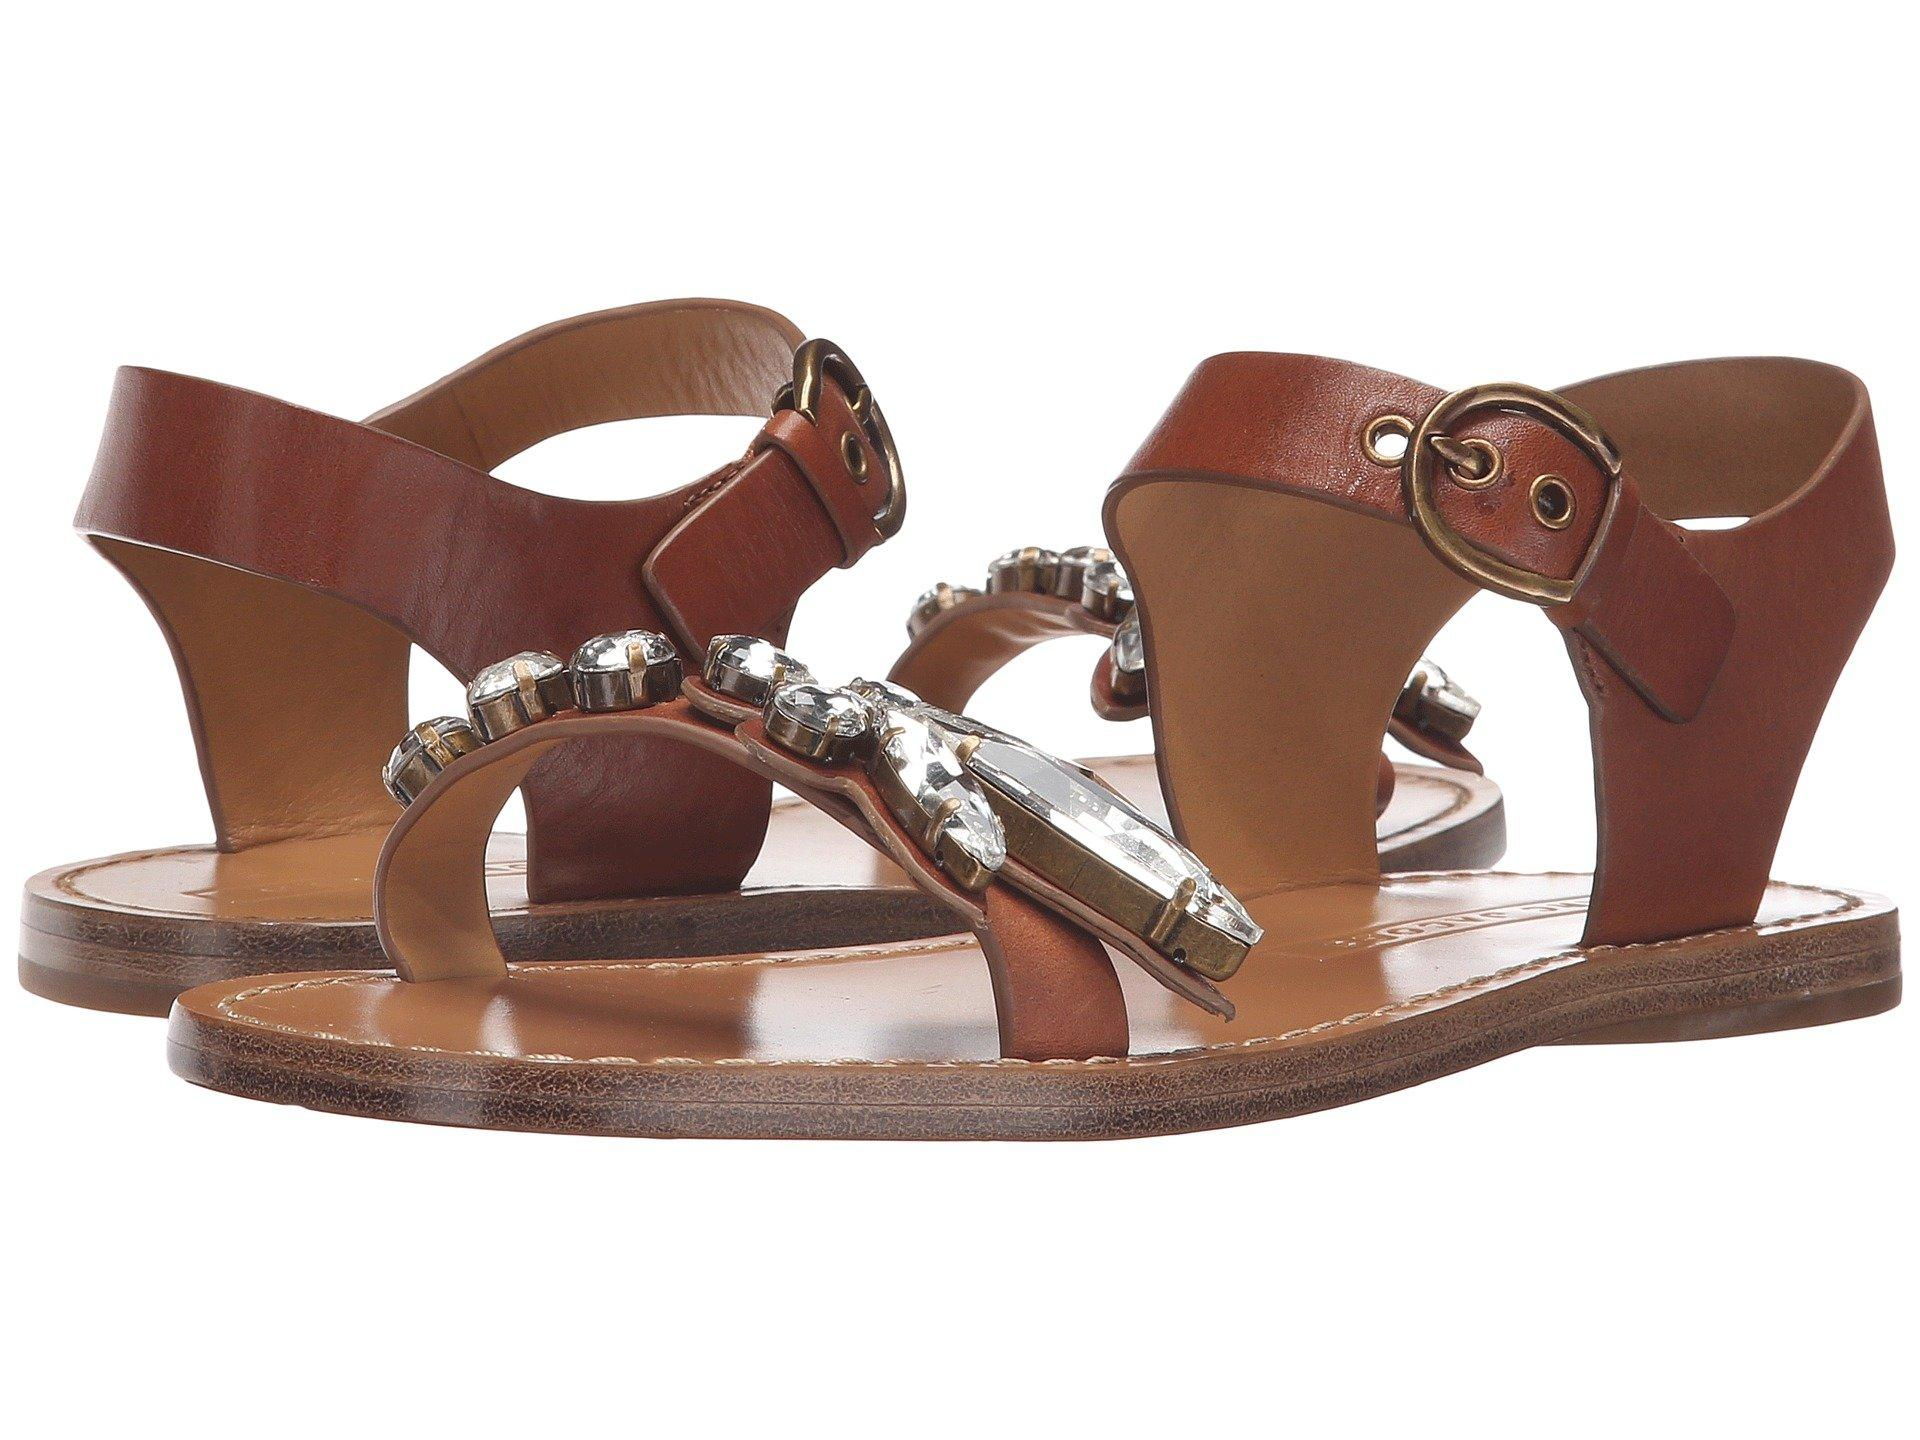 Marc Jacobs Rivington Embellished Sandal In Luggage